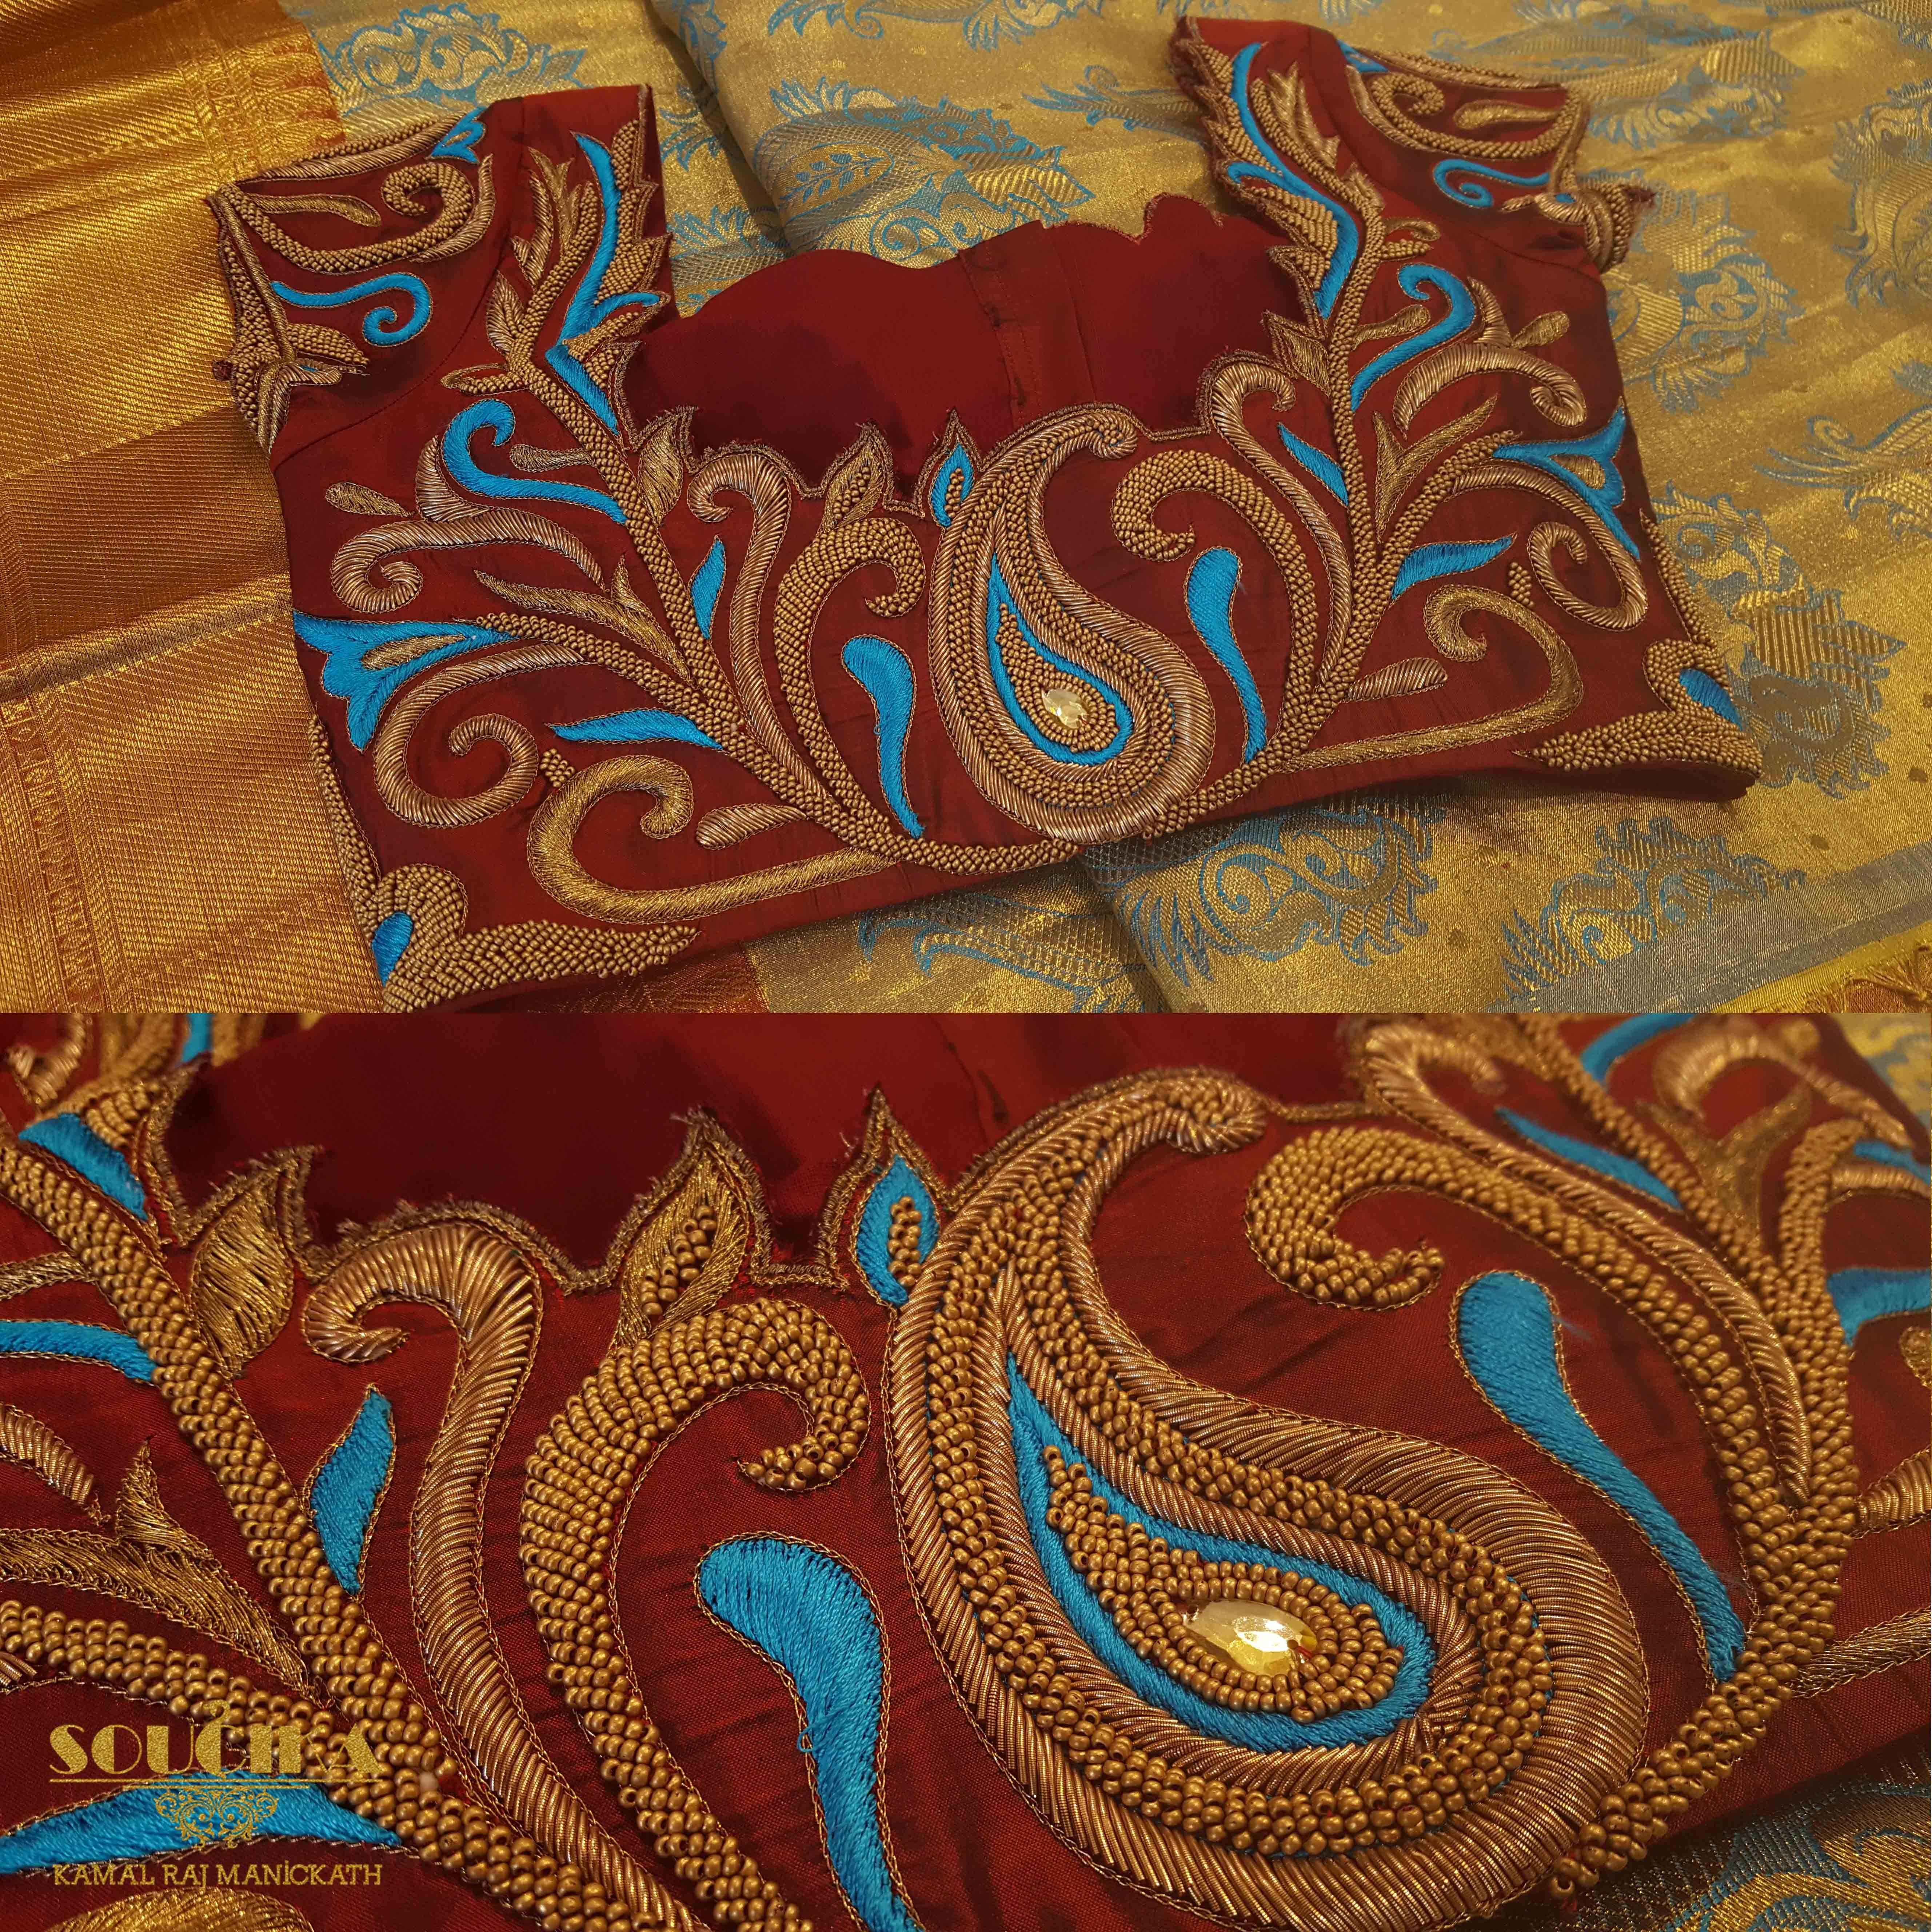 Sareeblouse soucika bangalore designersaree embroidery maggam work silk saree blouse designs by soucika south india fashion bankloansurffo Images